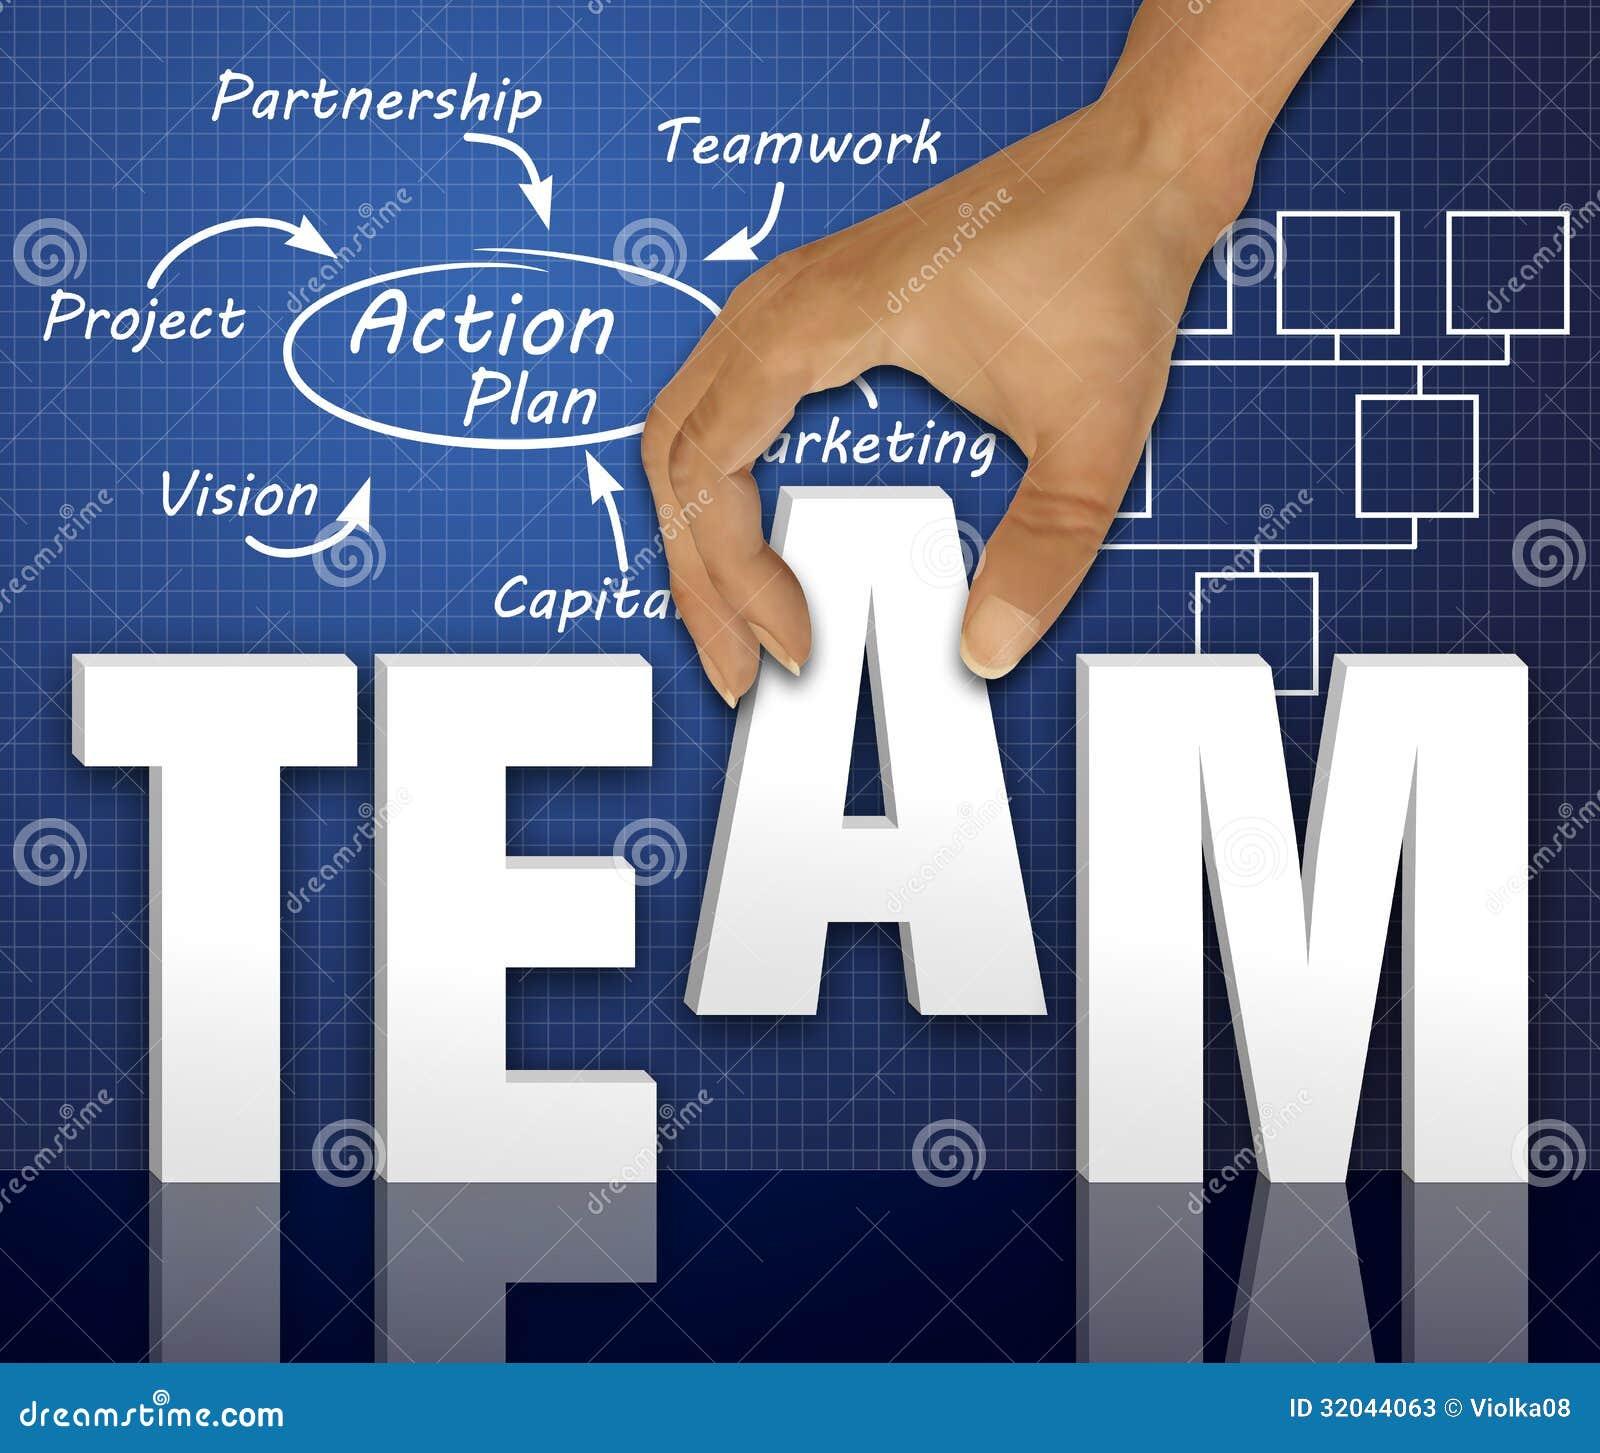 Team Words Concept Stock Photos - Image: 32044063